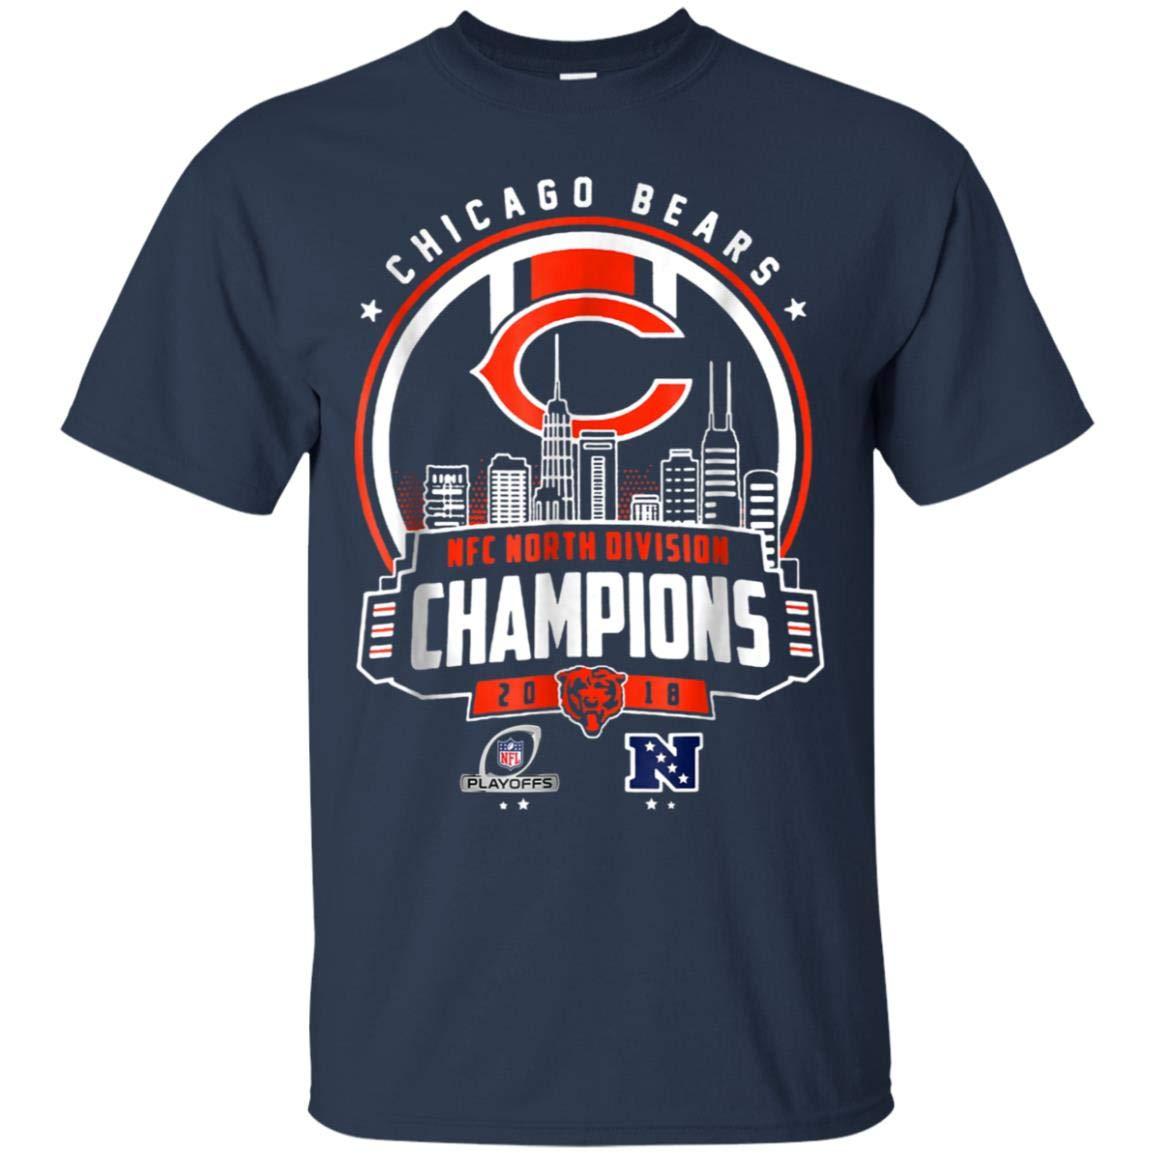 0f43350ea1f Amazon.com: Chicago Bears NFC North Division Champion 2018 Playoffs:  Clothing